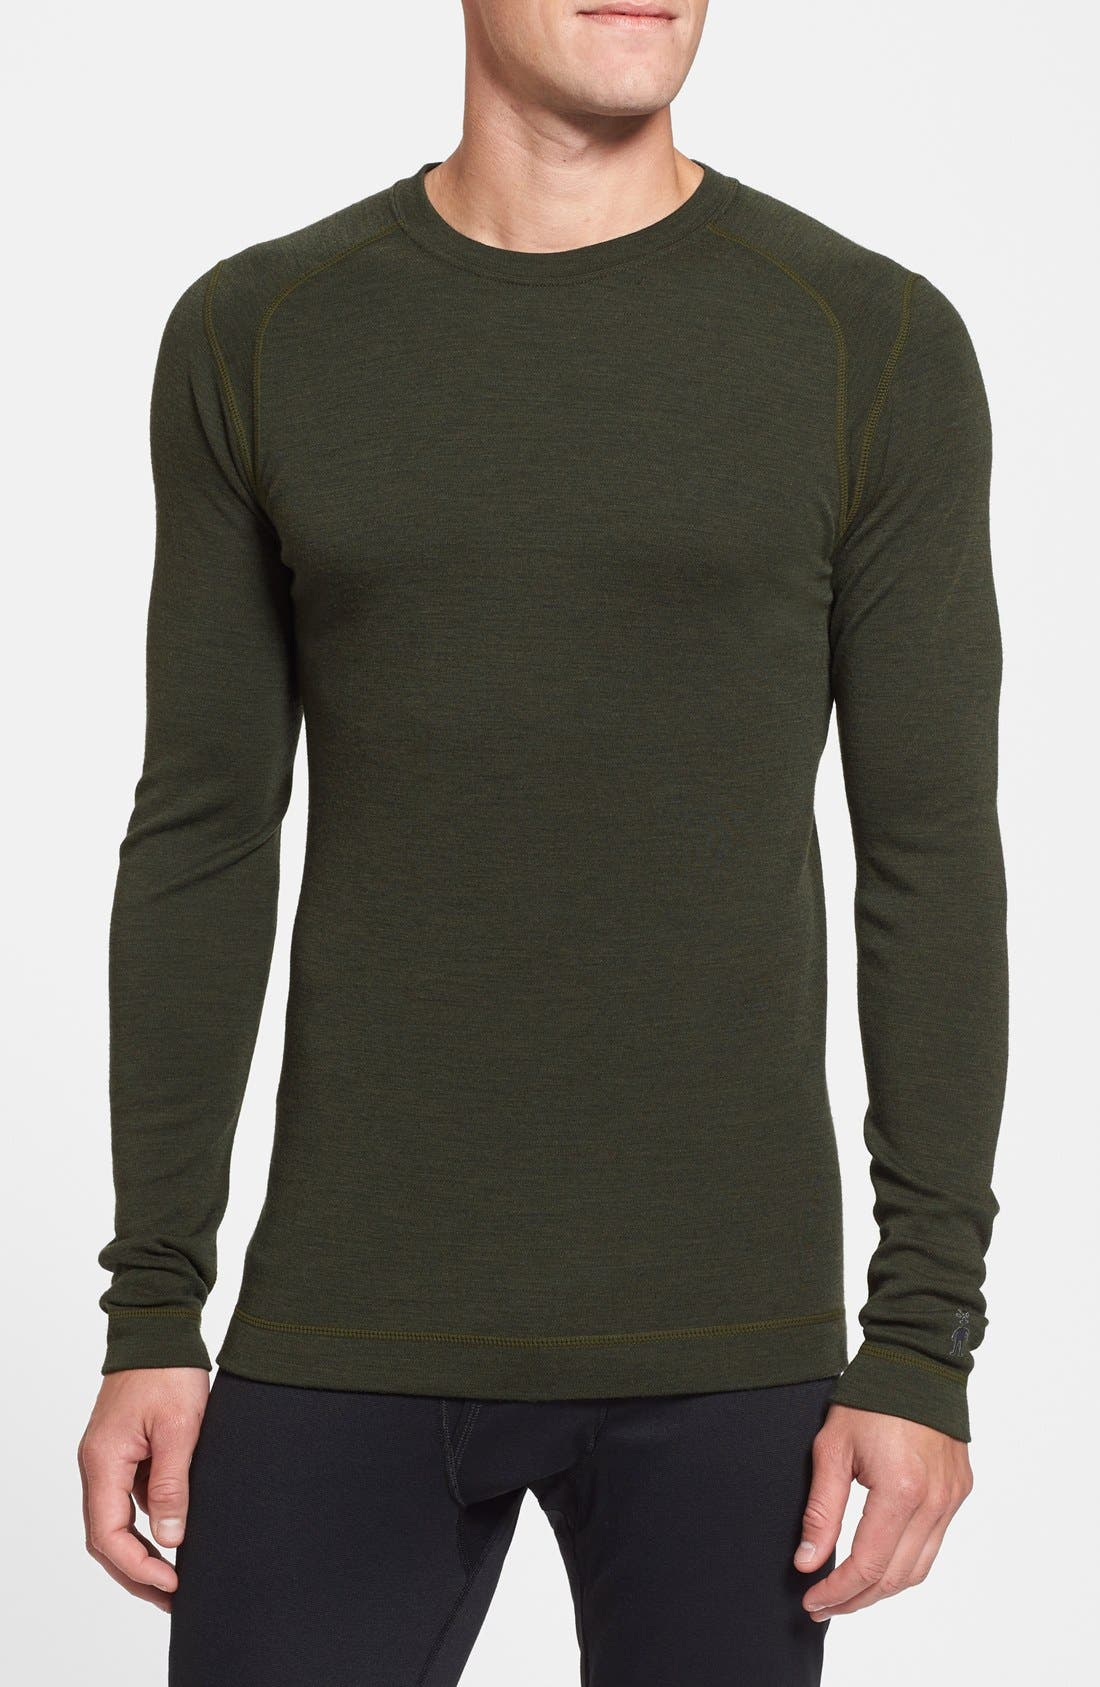 Alternate Image 1 Selected - Smartwool 'Midweight 250' Base Layer Merino Wool Crewneck Shirt